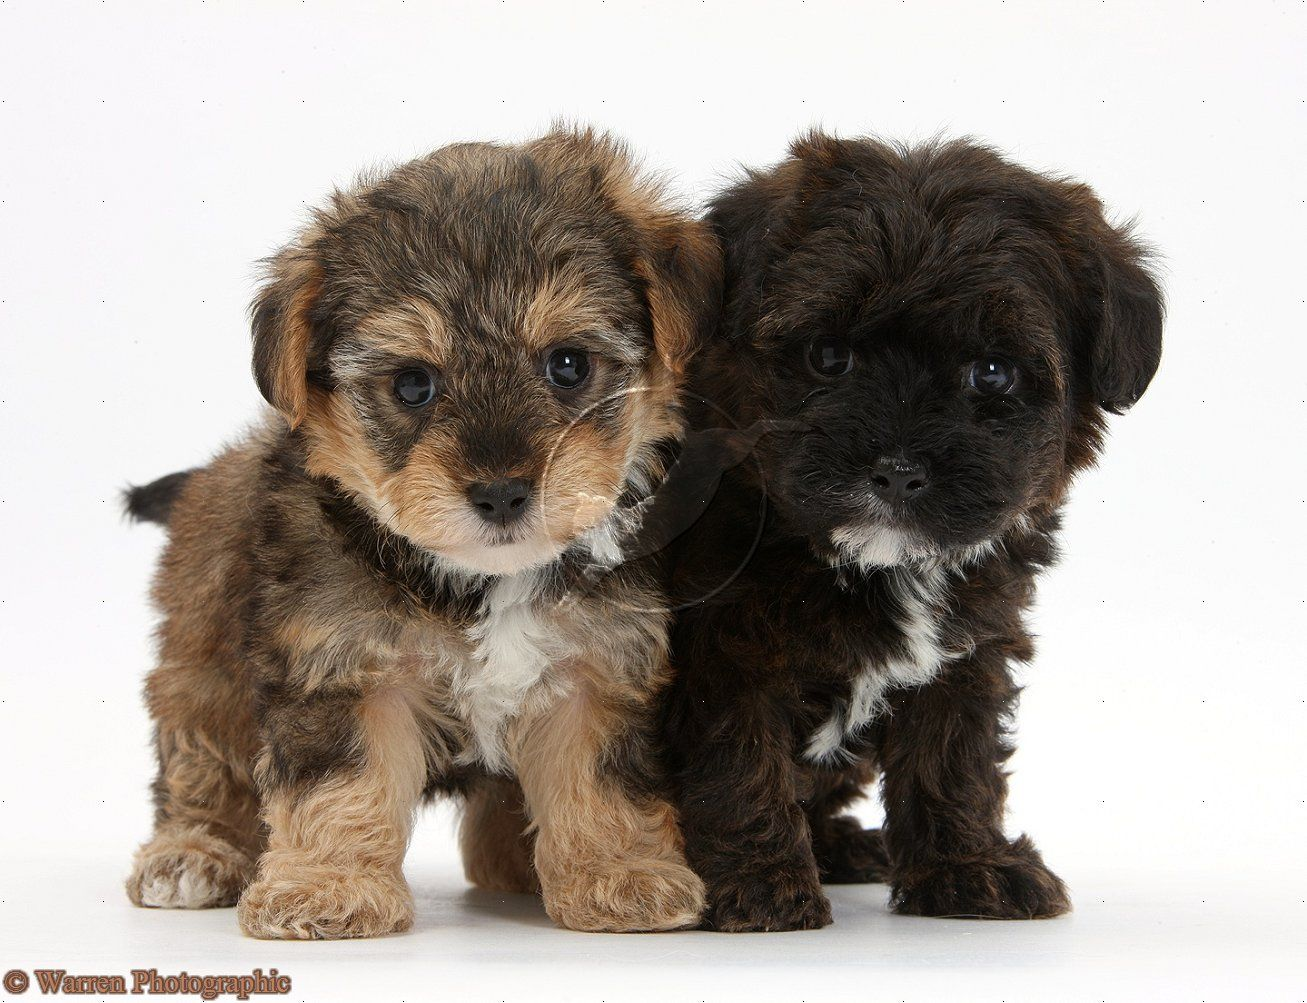 yorkiepoo dogs cute Yorkie poo puppies, Yorkie poo